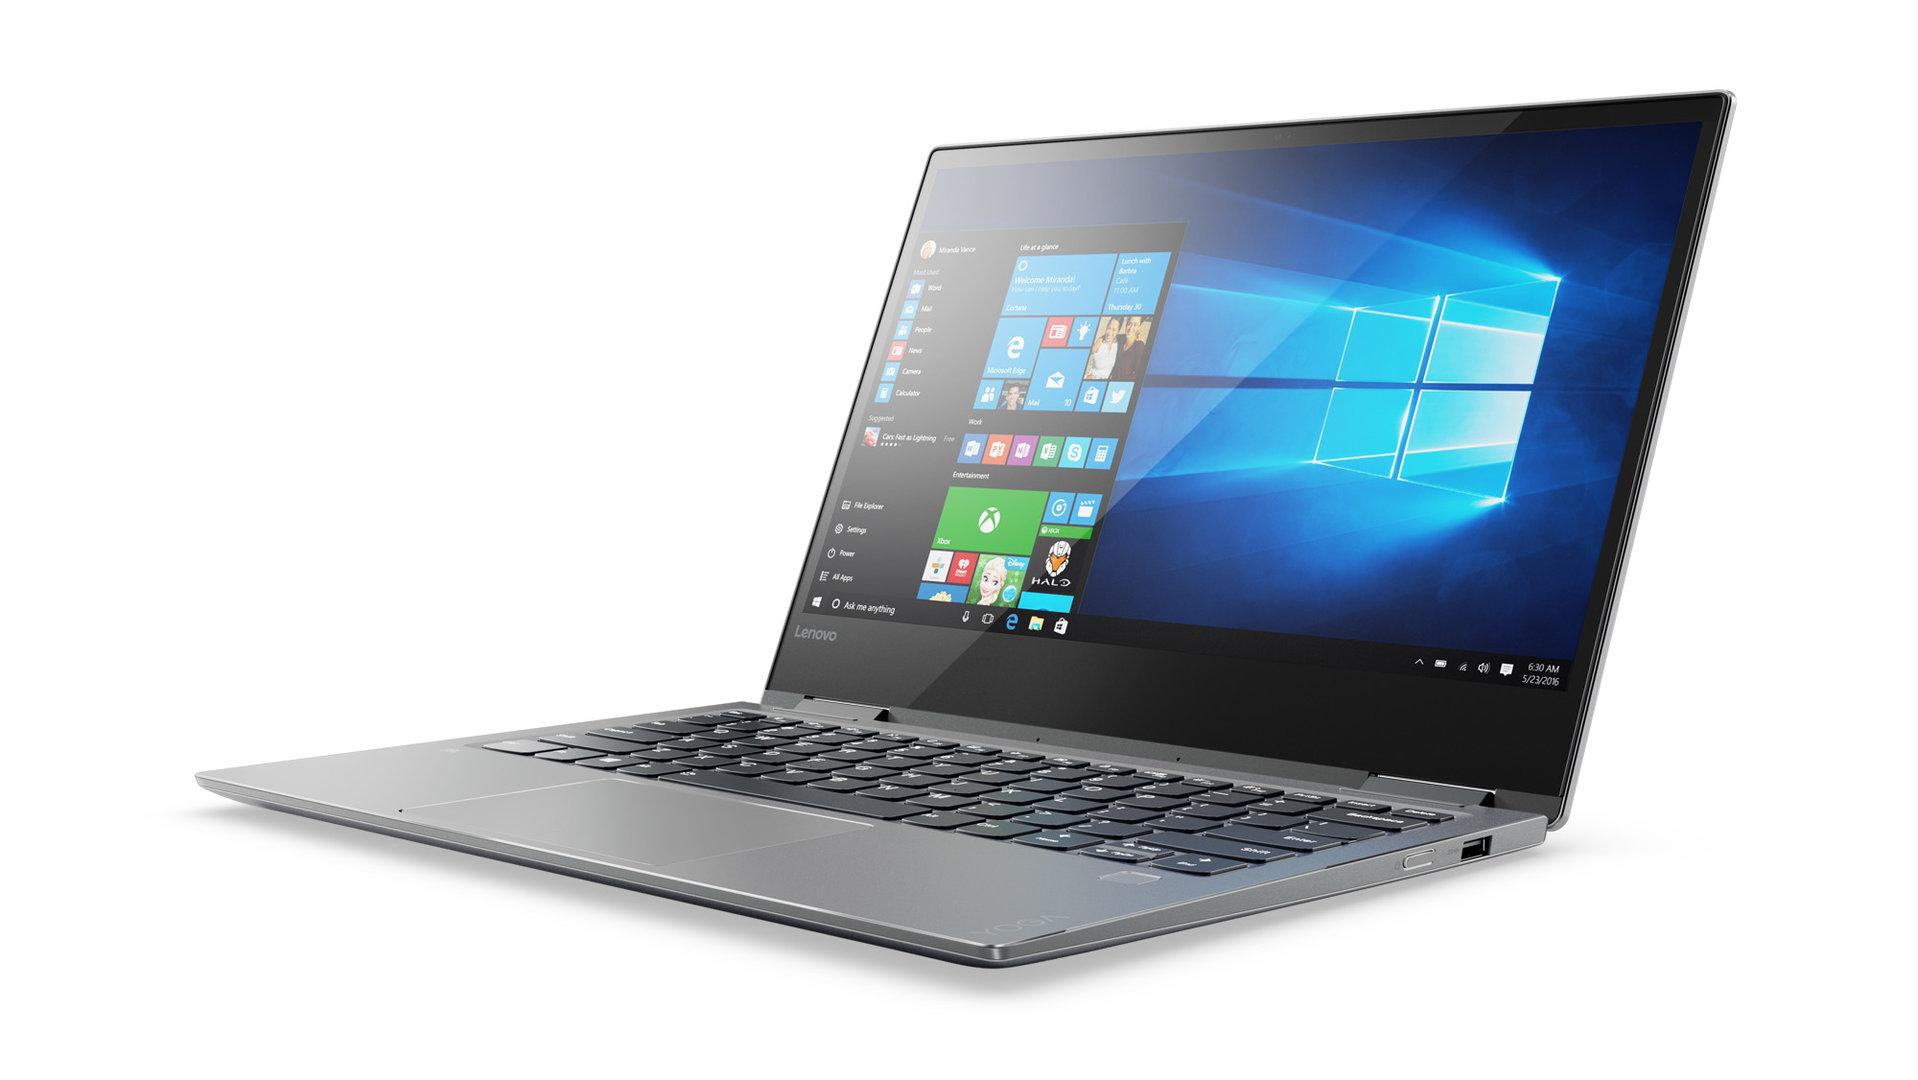 Lenovo Yoga 720 (13 Zoll) in Grau